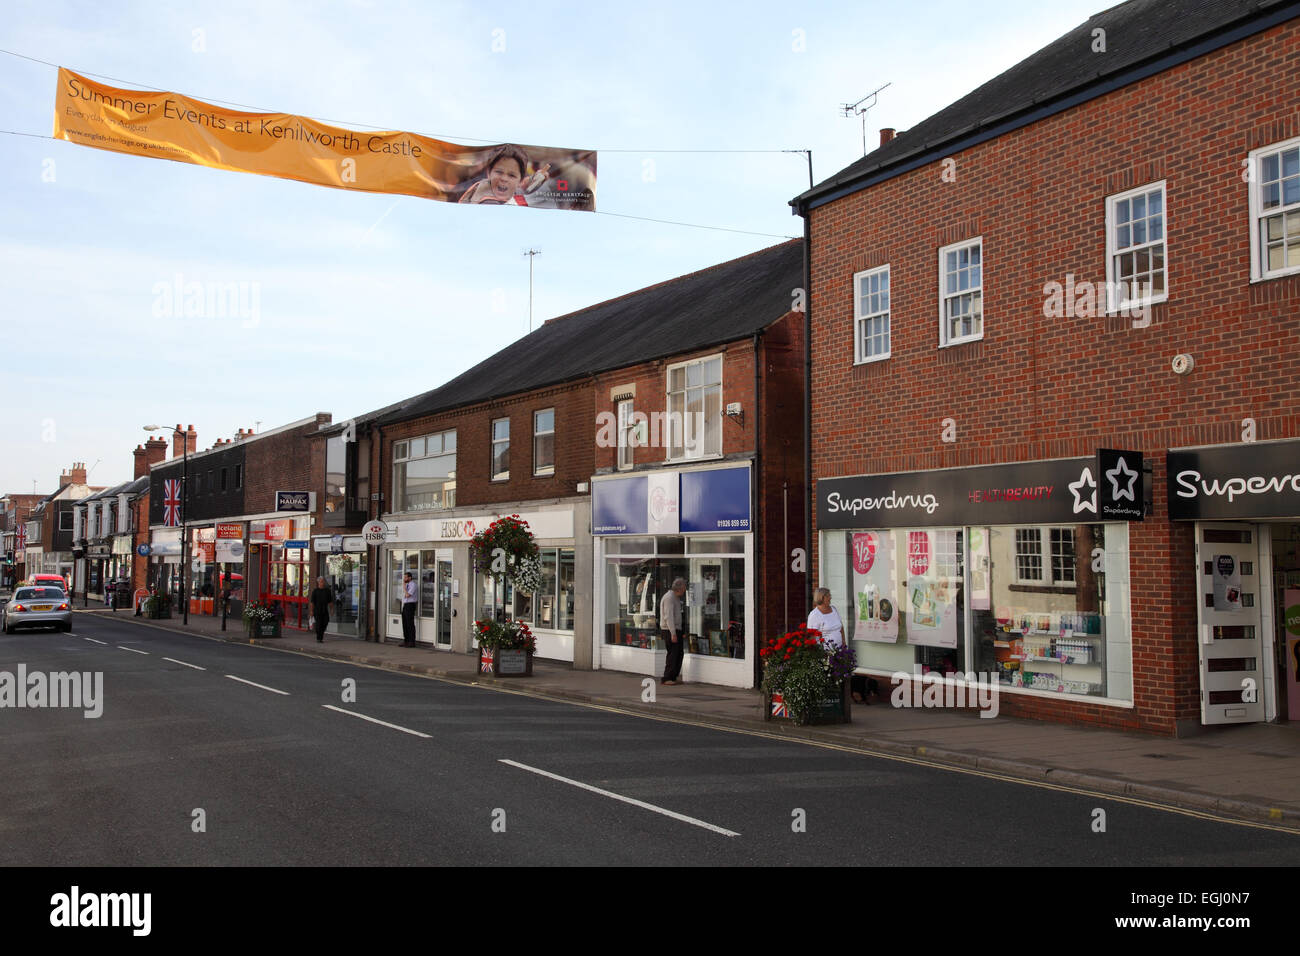 Shops in Kenilworth, Warwickshire UK - Stock Image